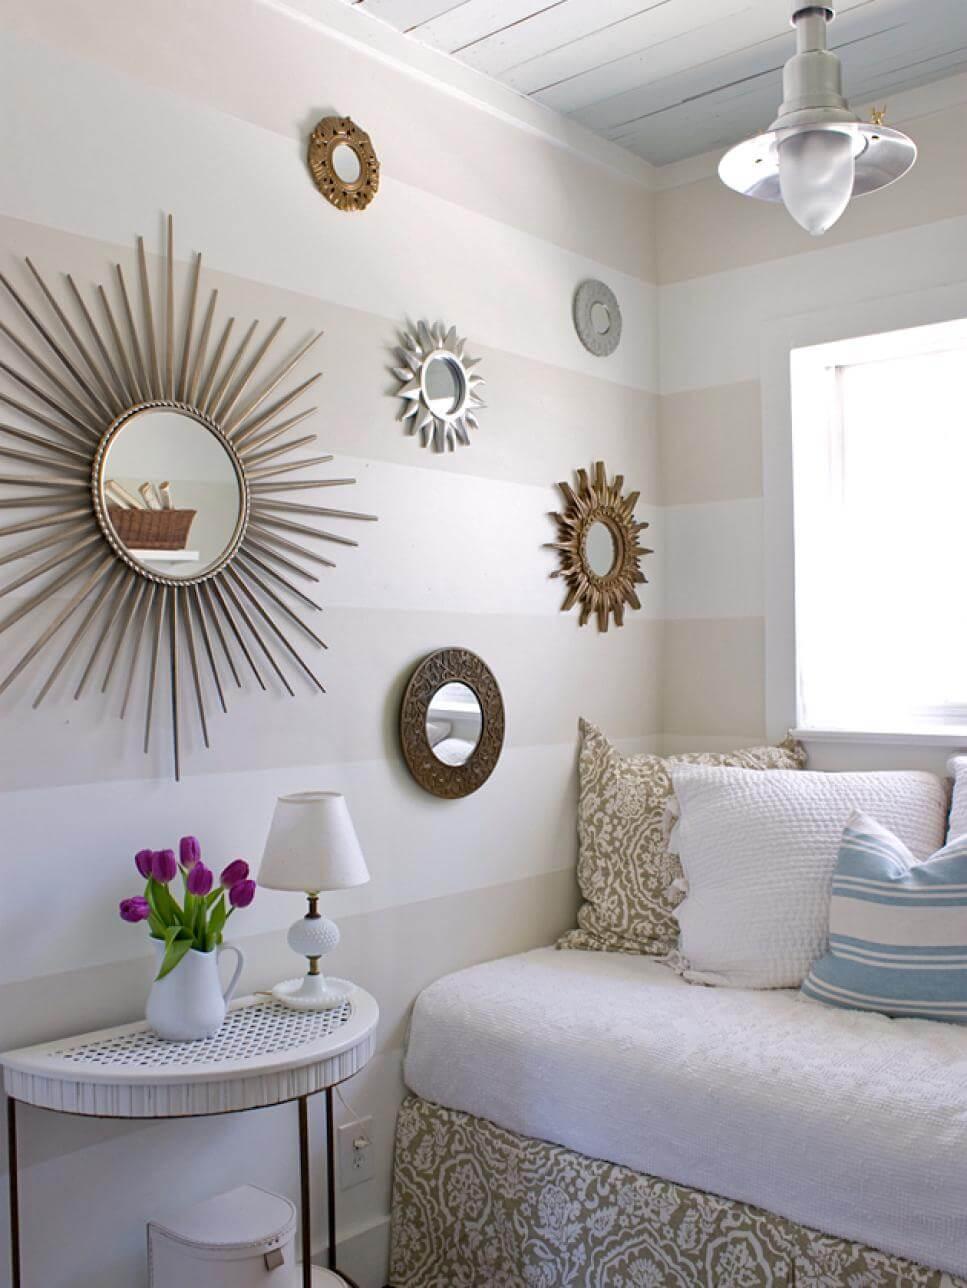 Room Wall Decoration Above Bed Handmade Sheets Wallpaper 908x1209 Download Hd Wallpaper Wallpapertip